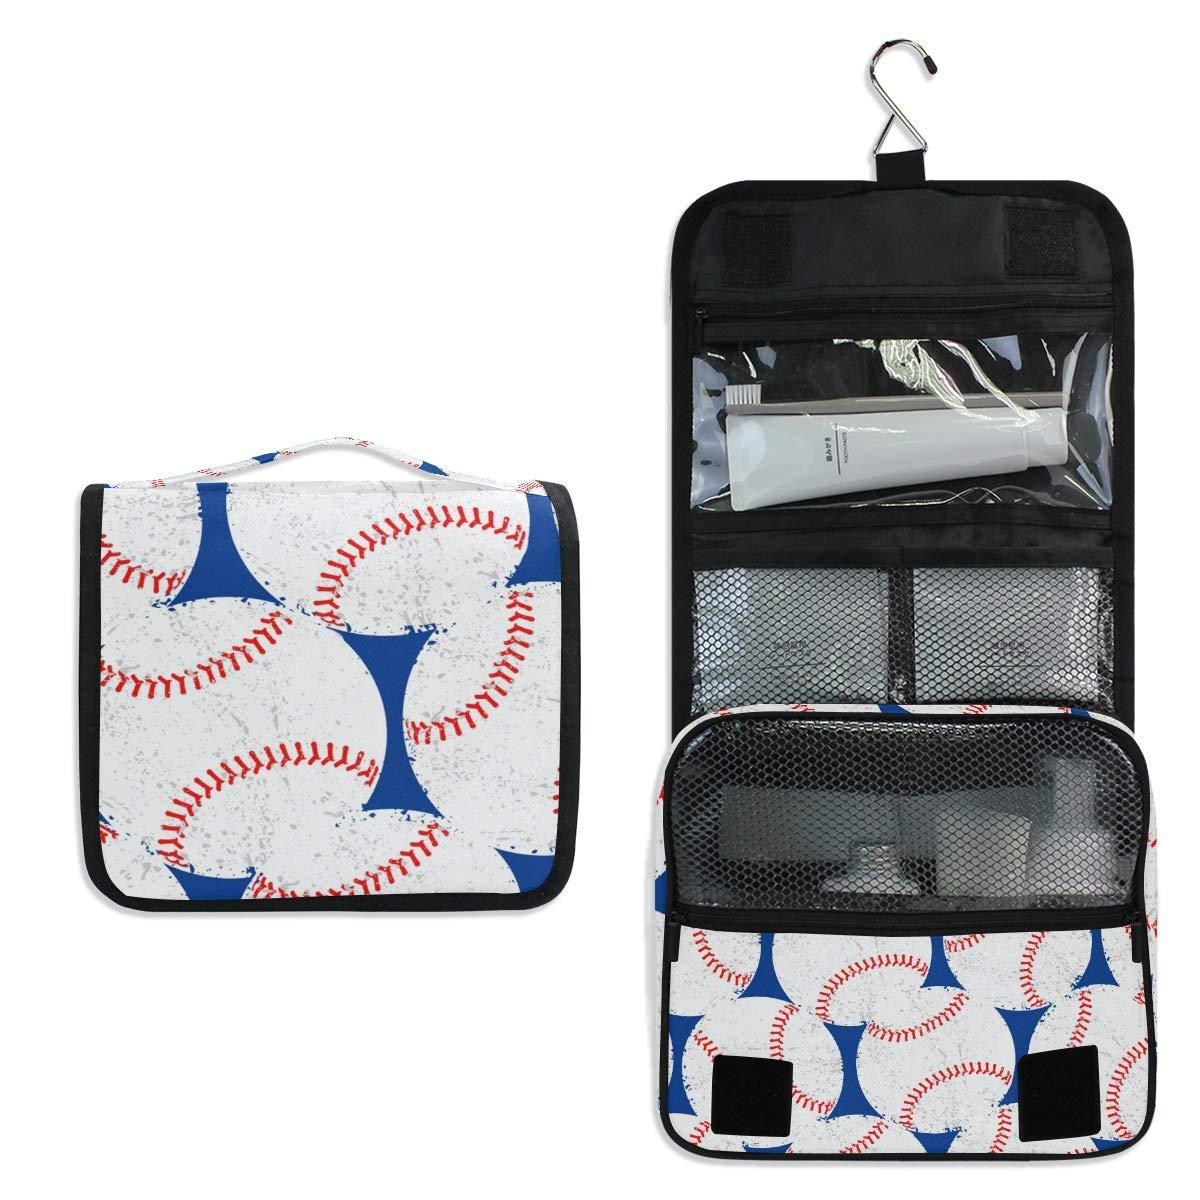 Toiletry Bag Travel Bag Hanging Hook - Baseballs Waterproof Cosmetic Bag Portable Makeup Pouch for Girls Men Women